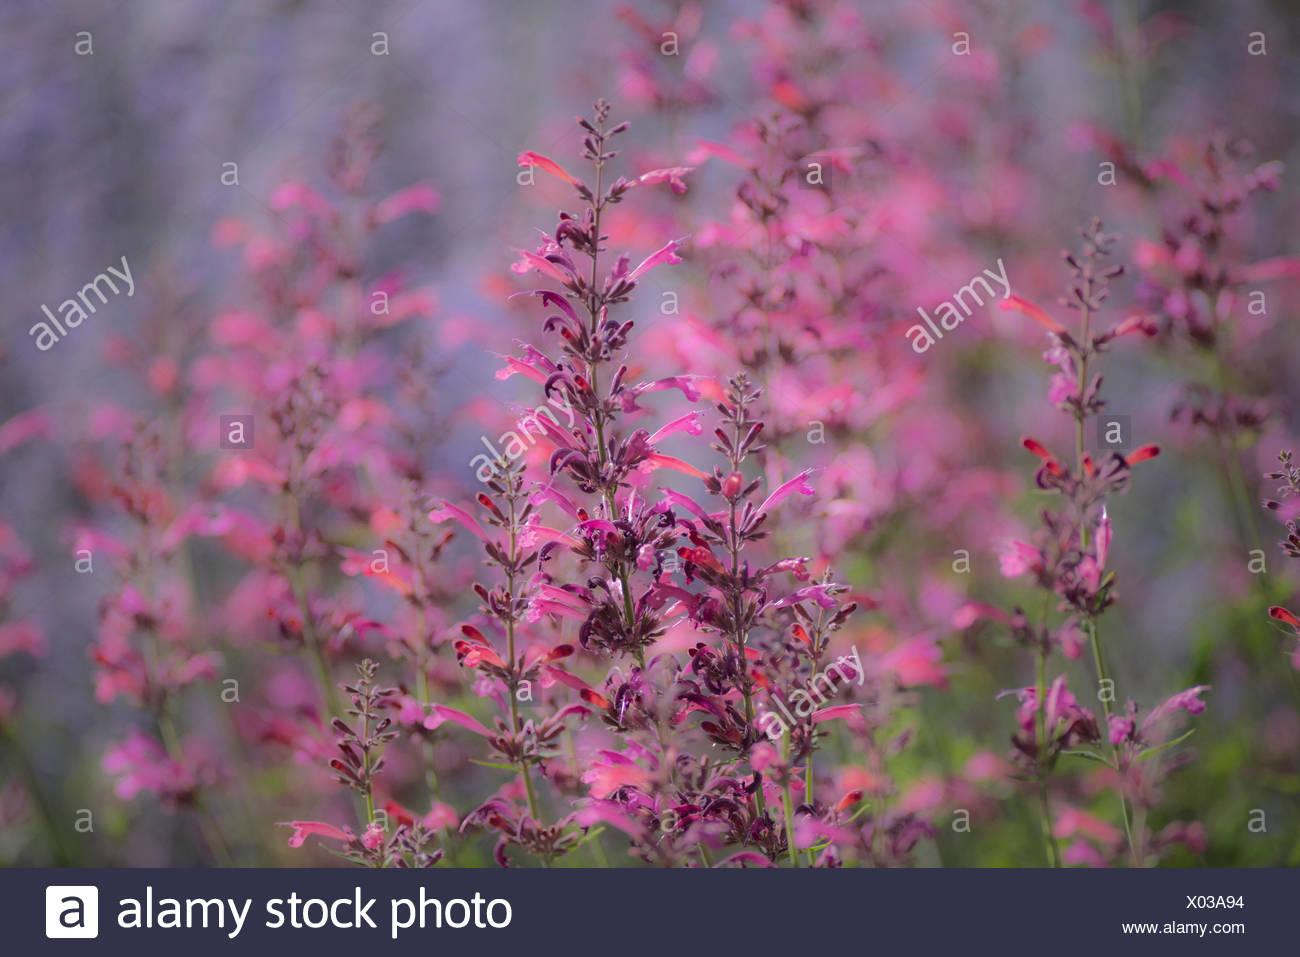 Oregon, Bend, garden - Stock Image